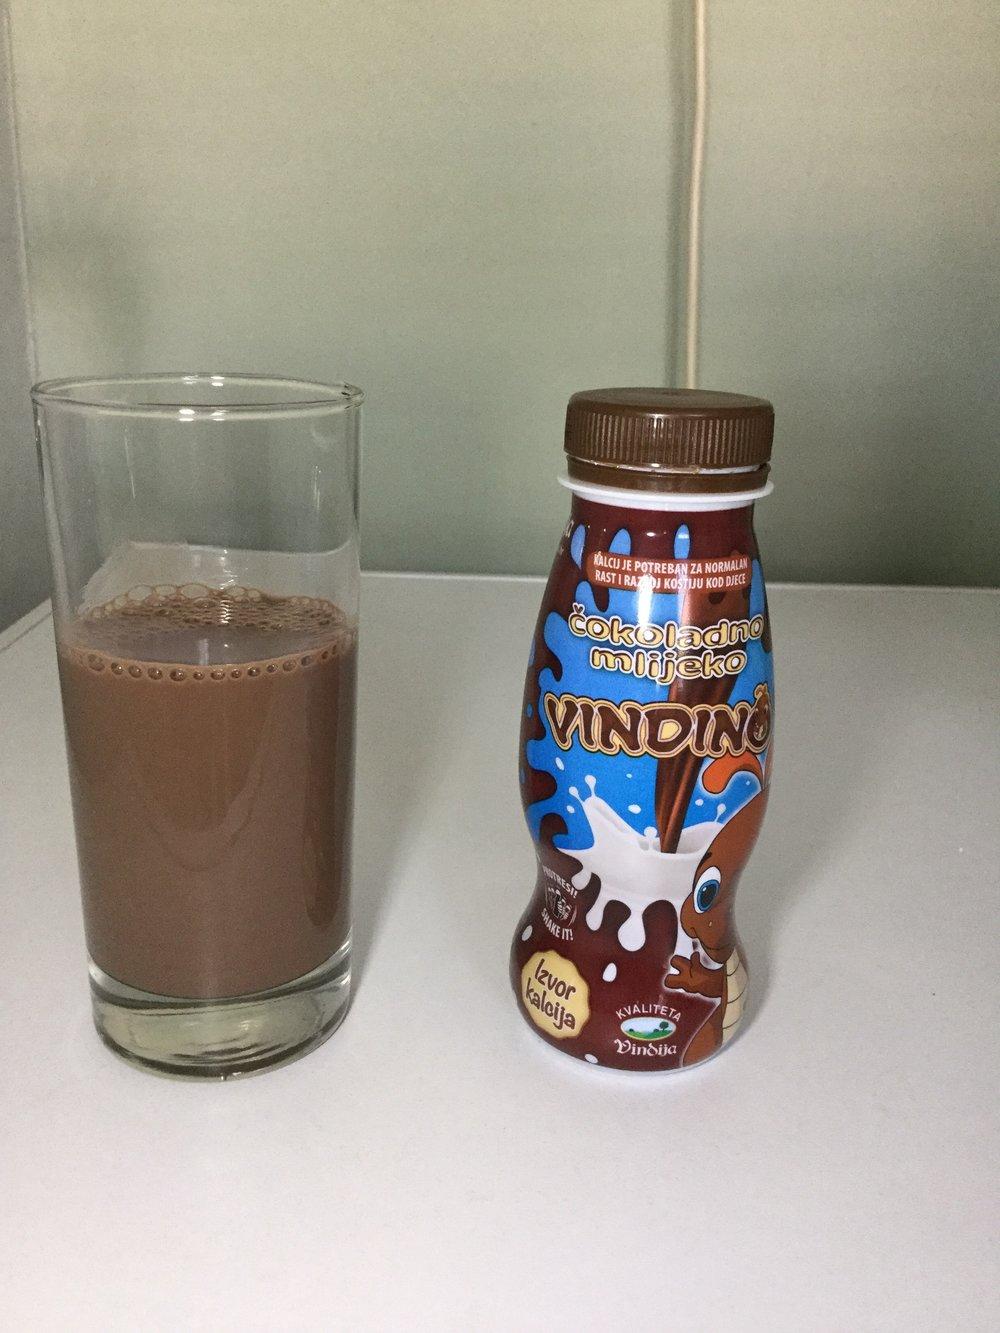 Kvaliteta Vindija Vindino Čokoladno Mlijeko Cup